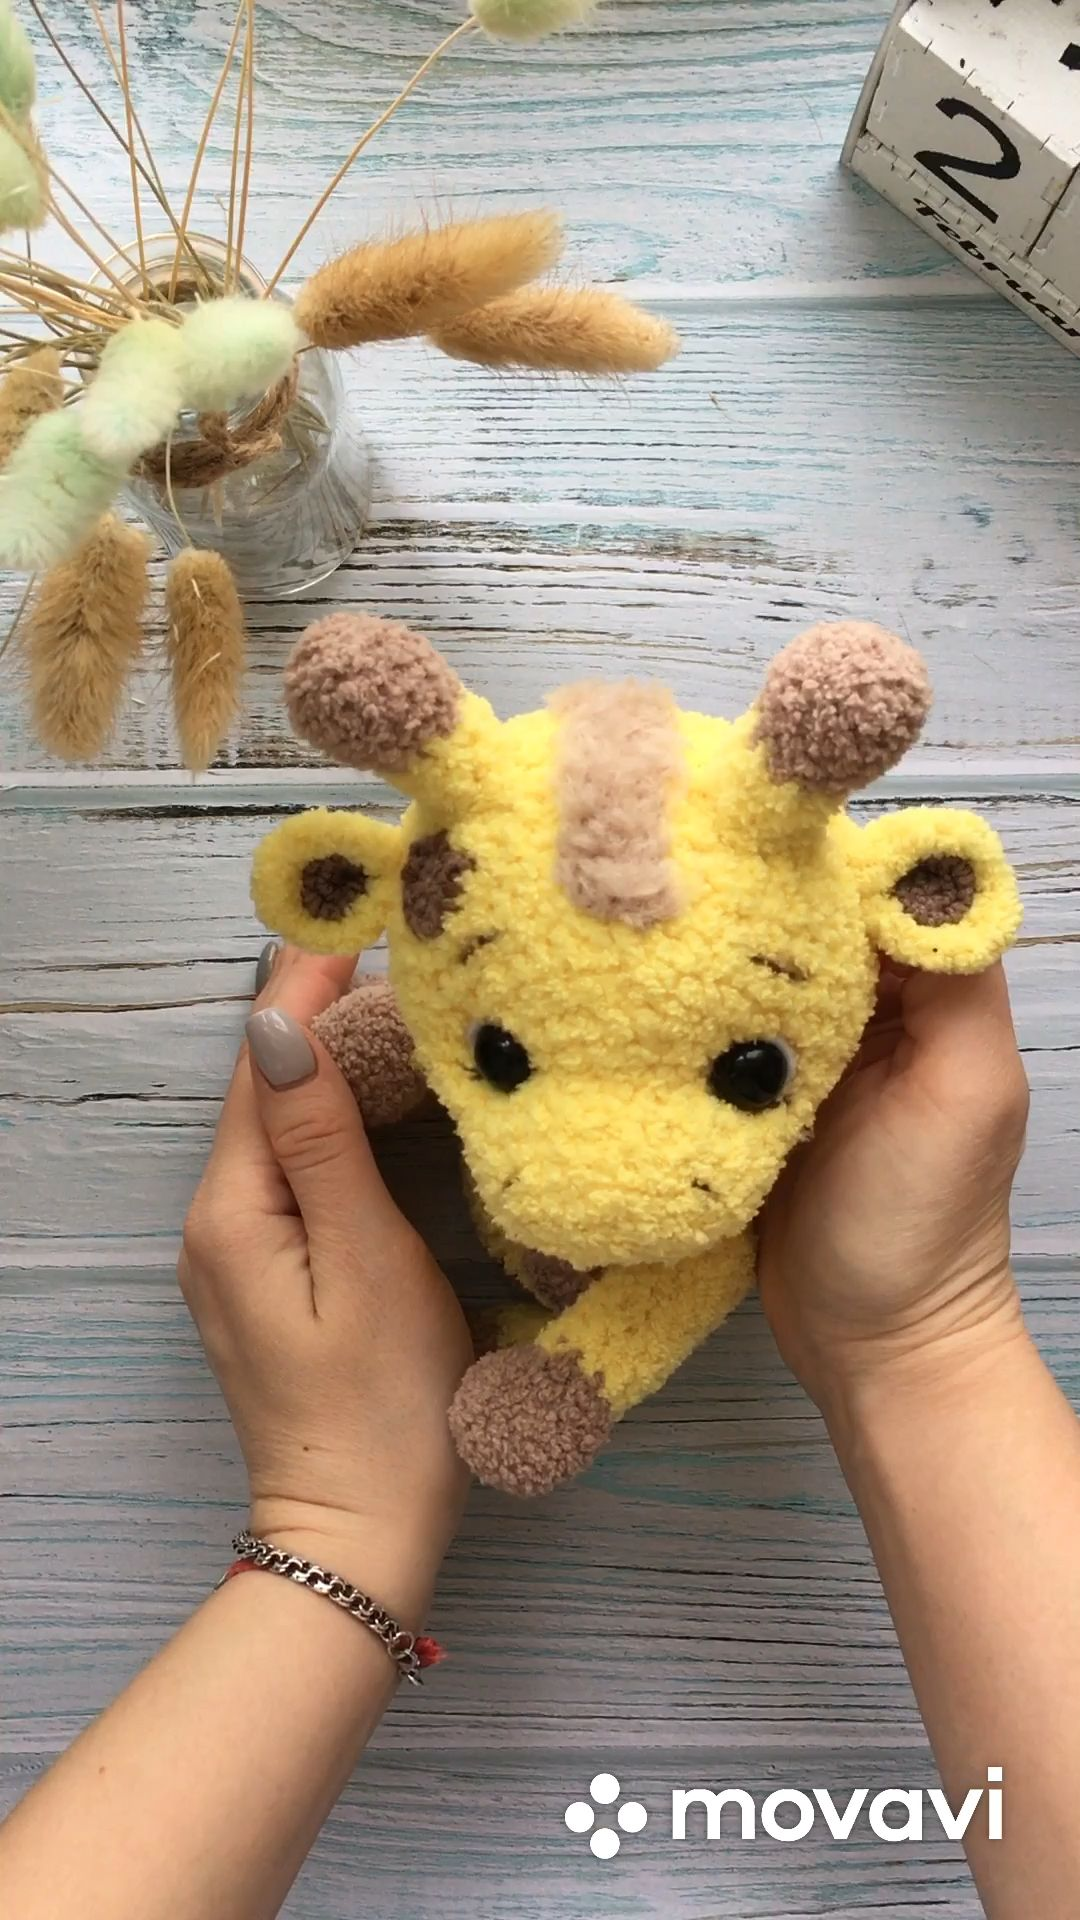 Photo of Giraffe häkeln Amigurumi Muster. wie man eine Giraffe häkelt. Häkelmuster Spielzeug Amigurumi Giraffe